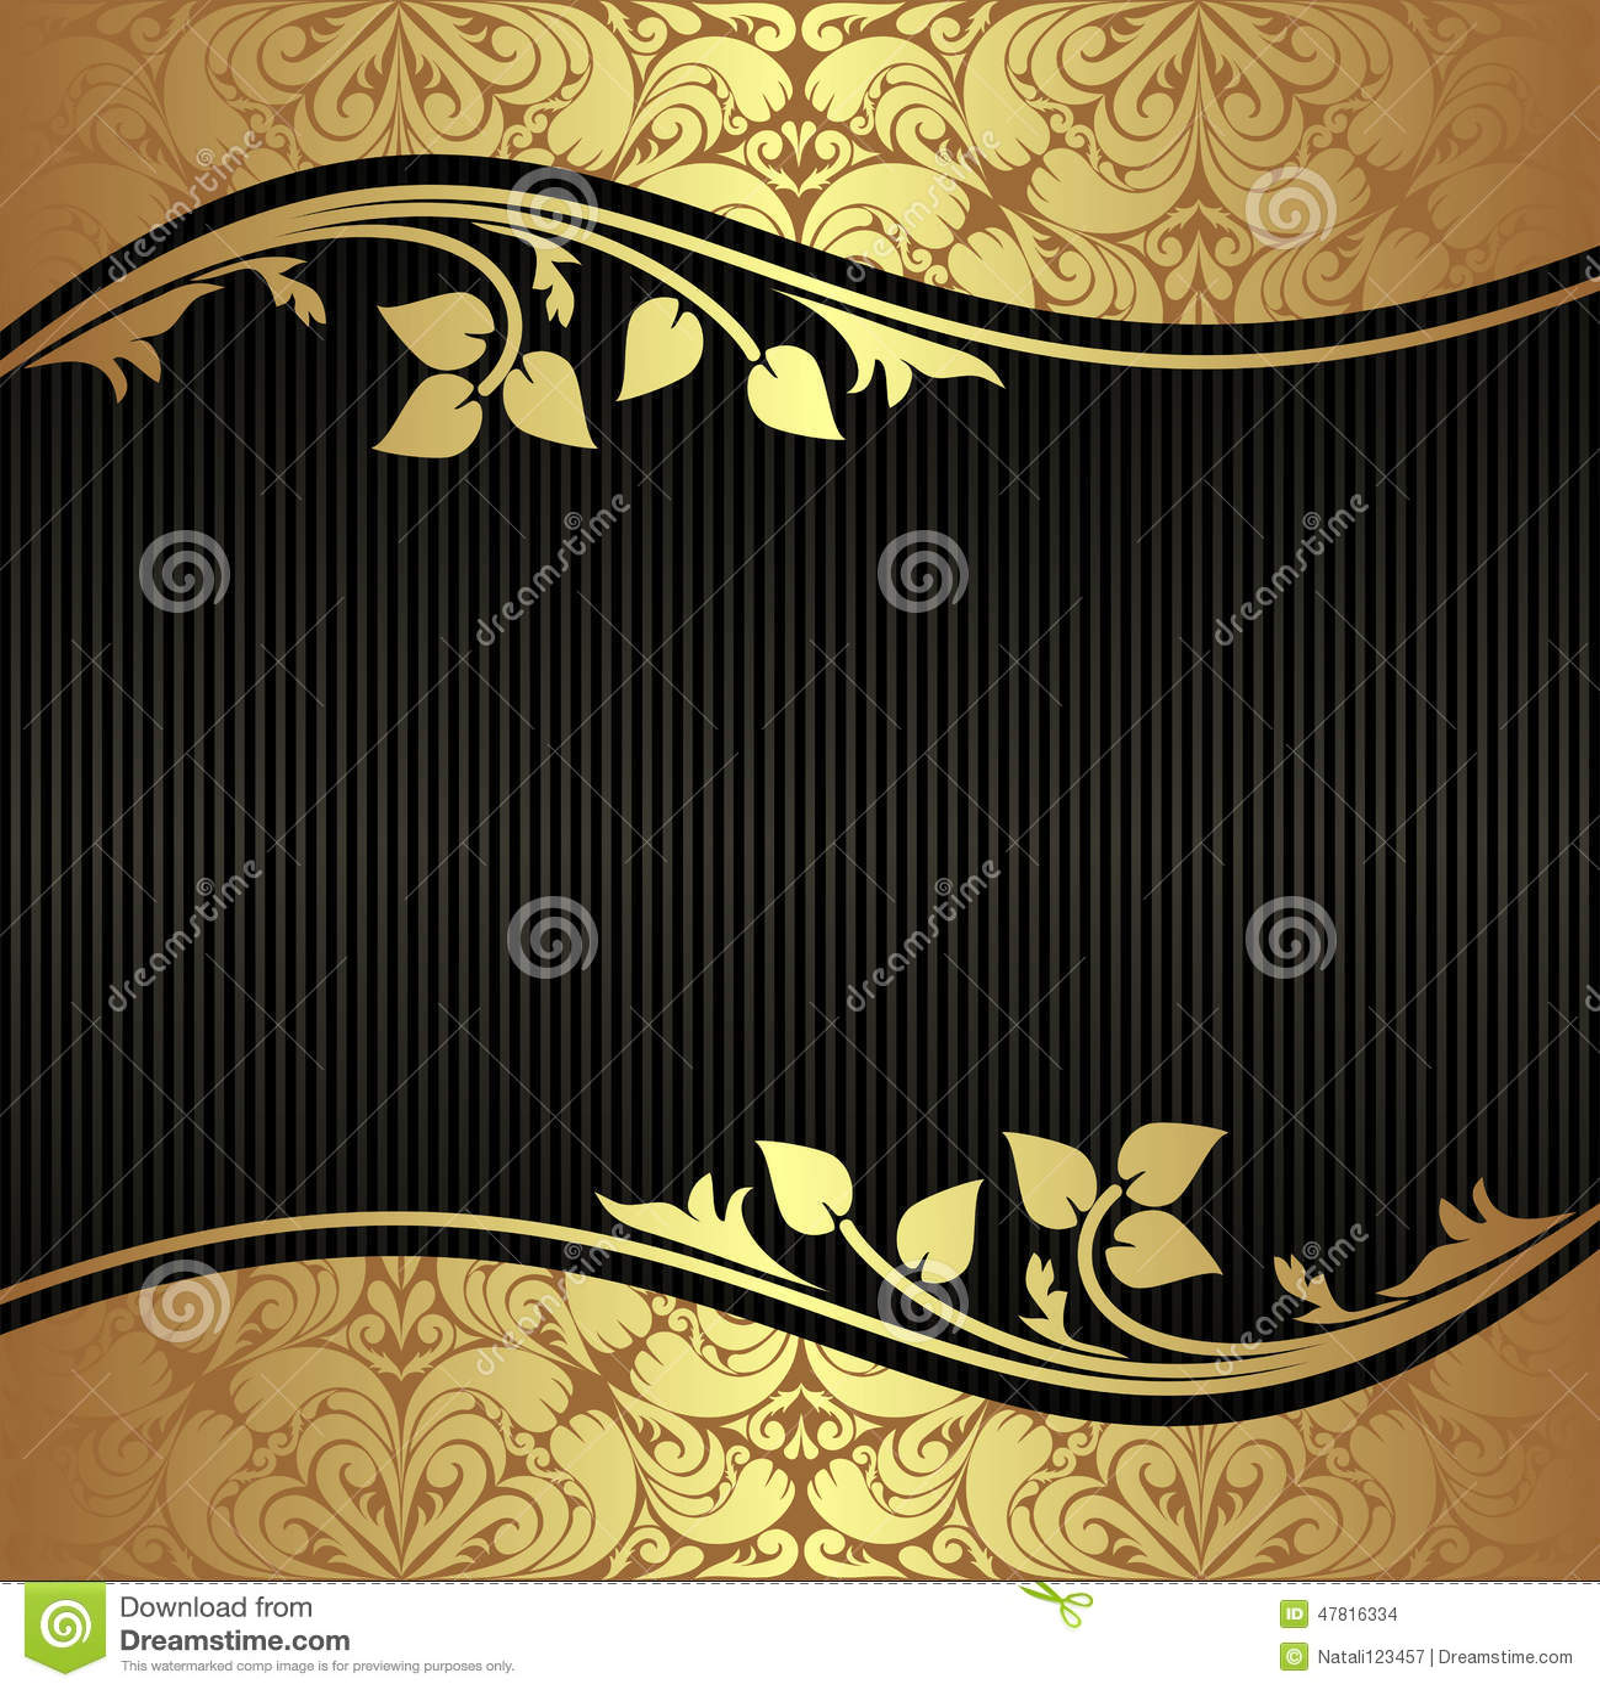 elegant black background with floral golden borders stock